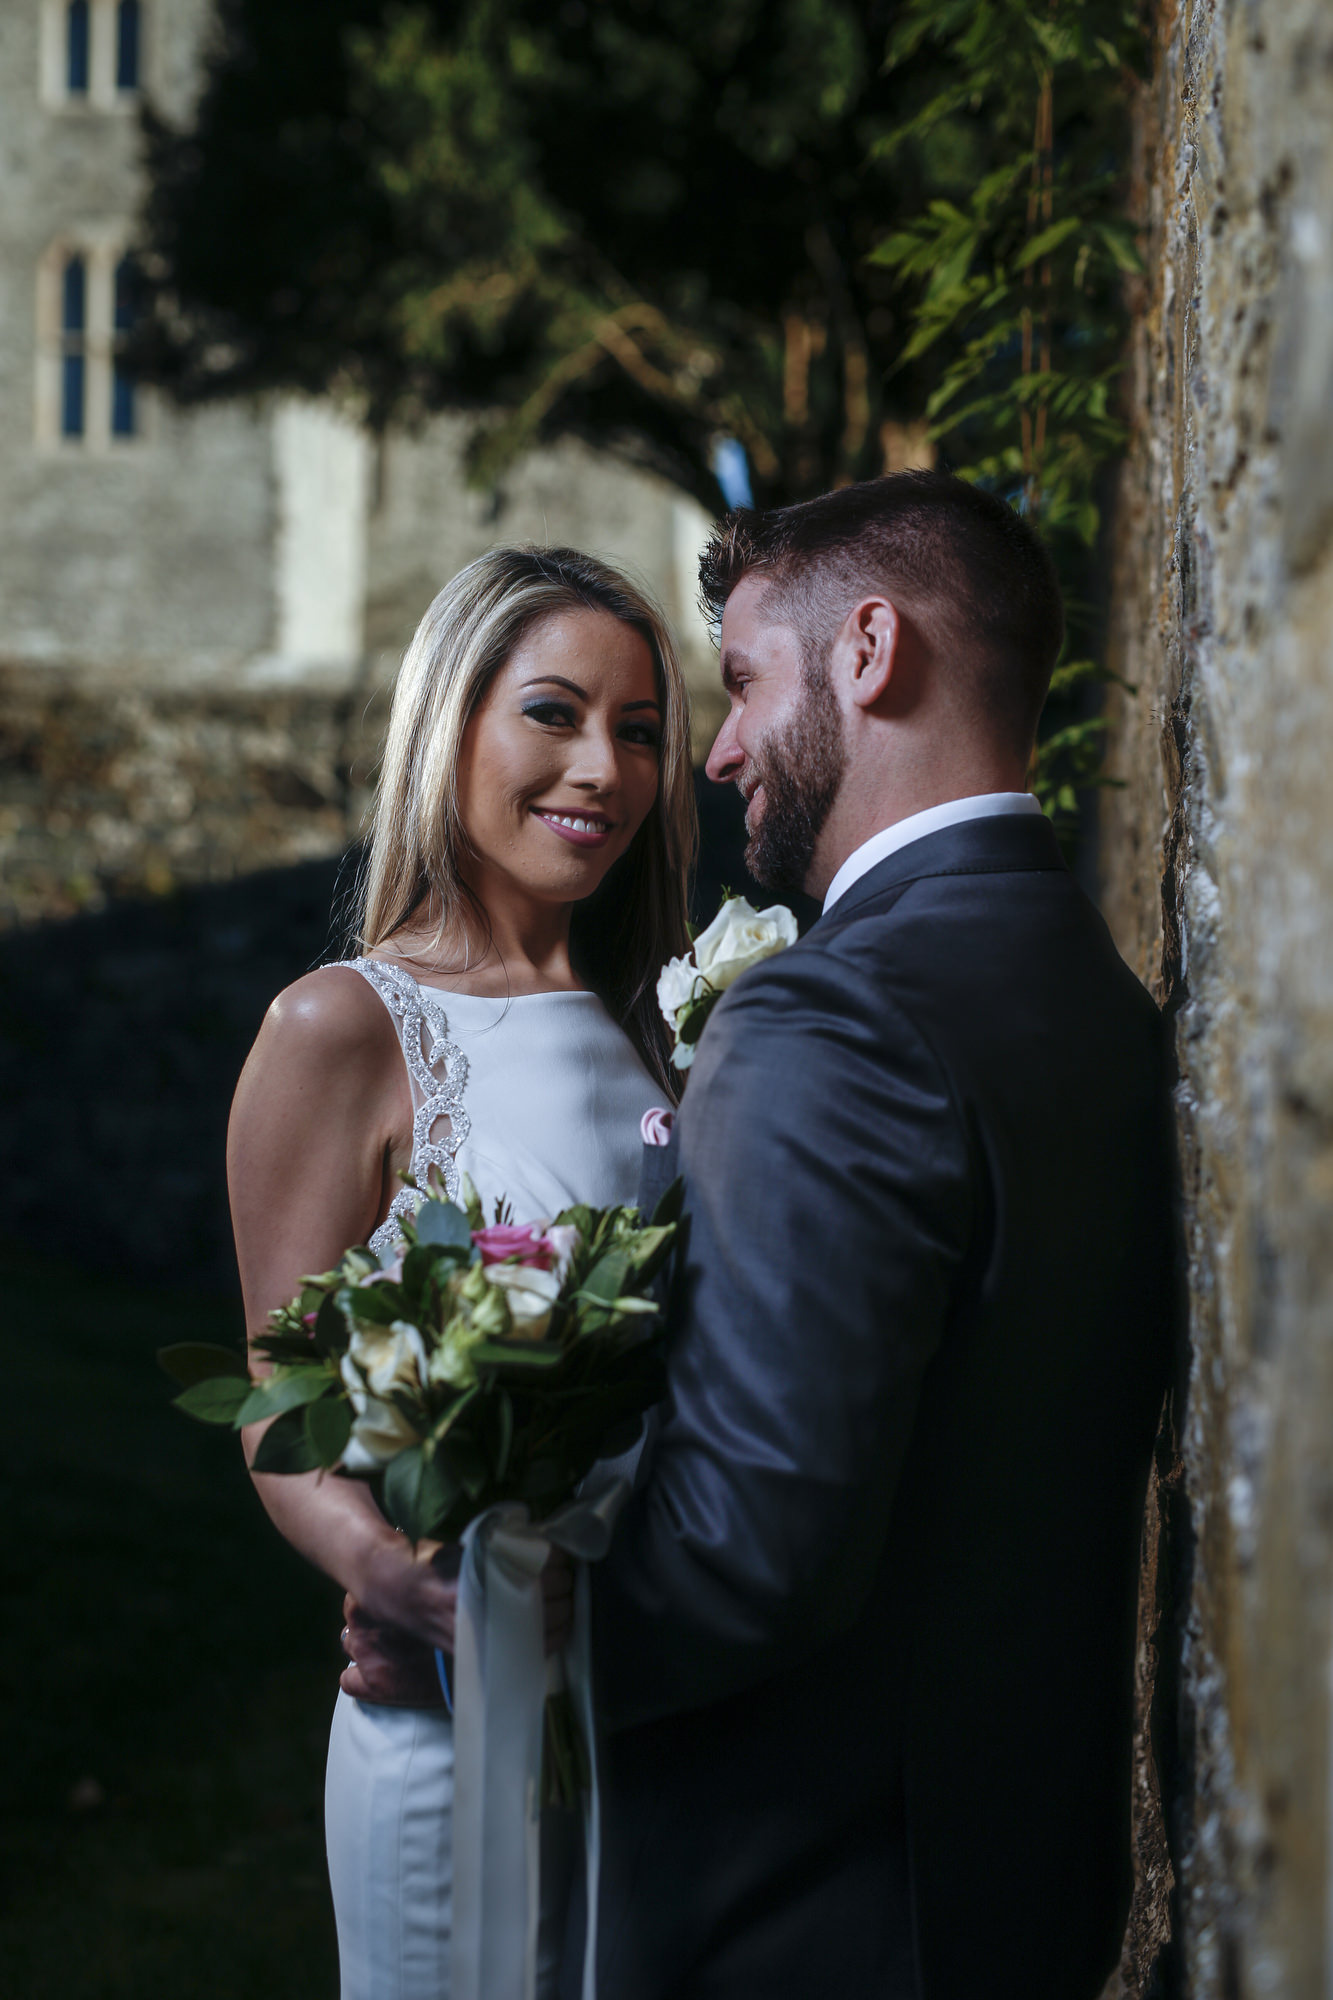 kilkea_castle_wedding_photographer_goldenmoments_043.jpg